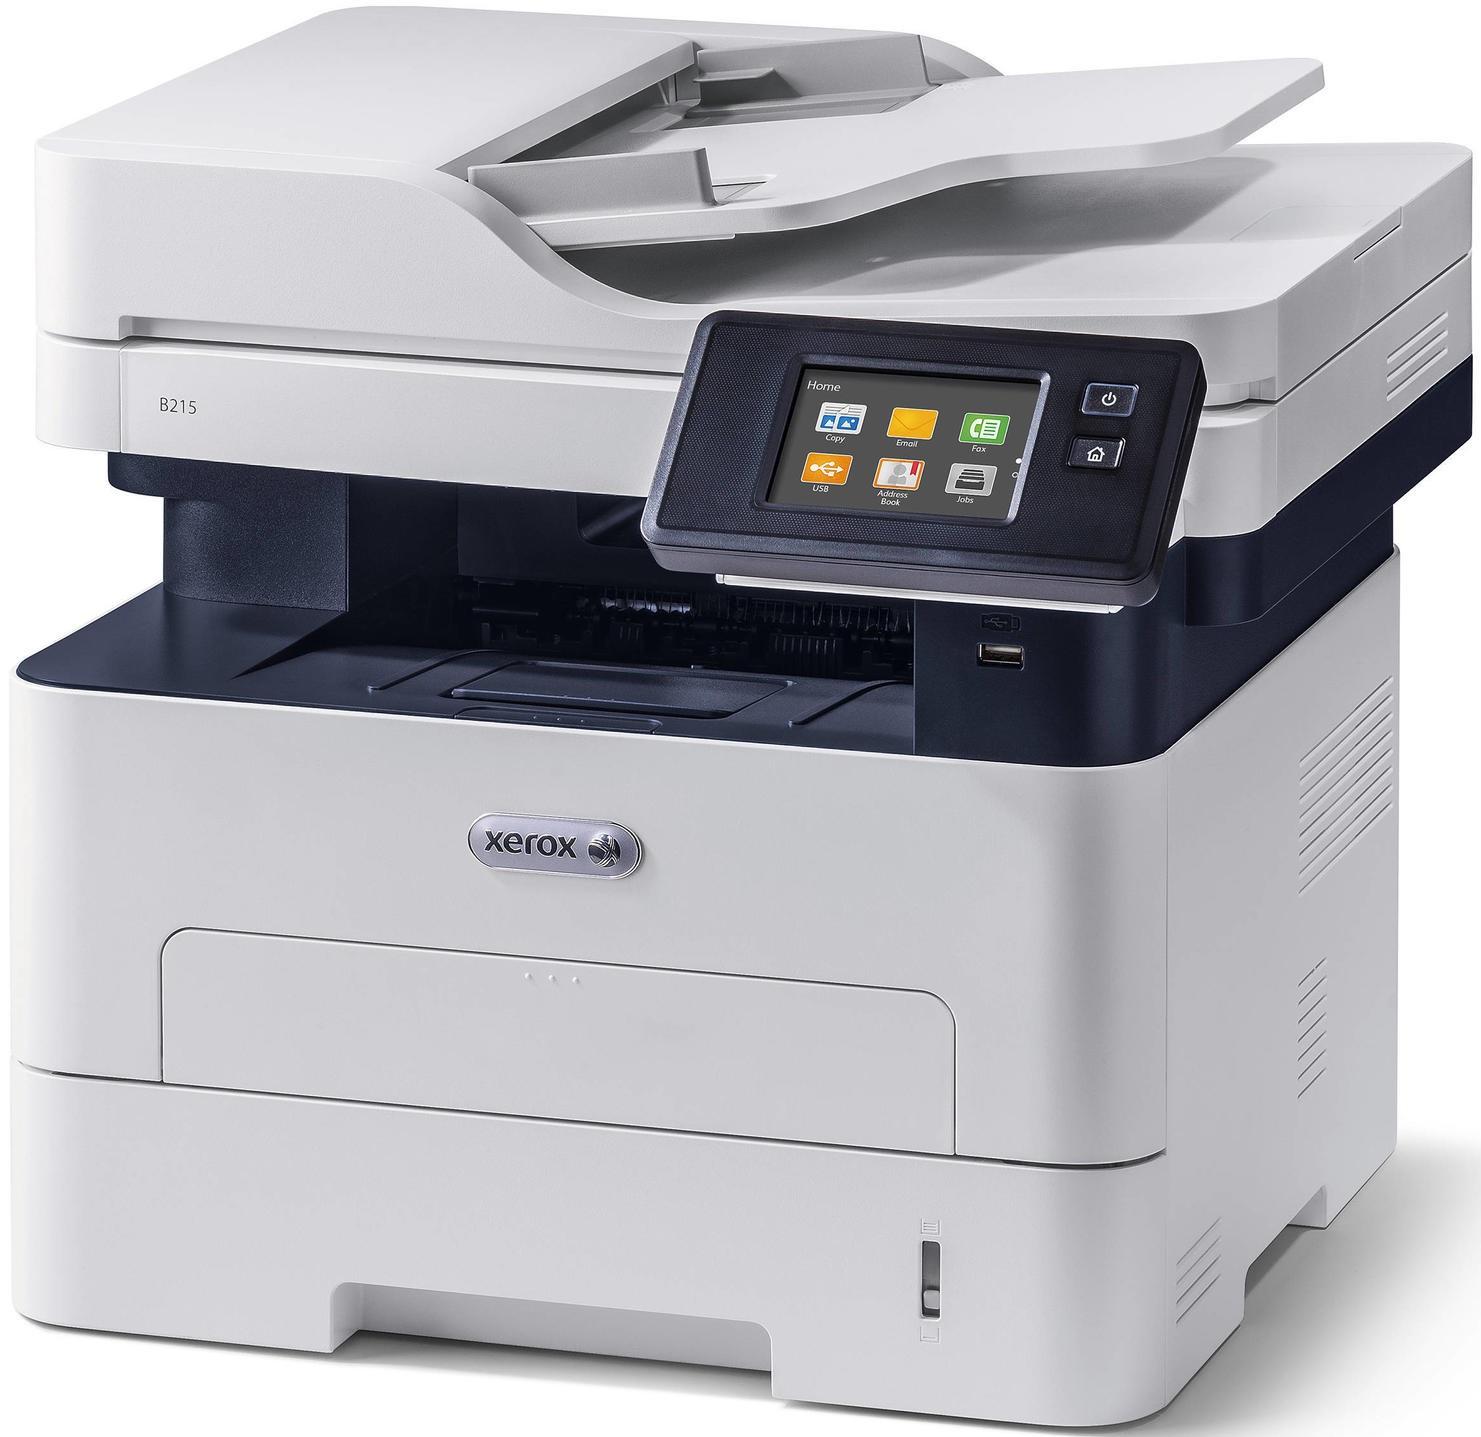 Xerox B215 fix firmware [chipless]